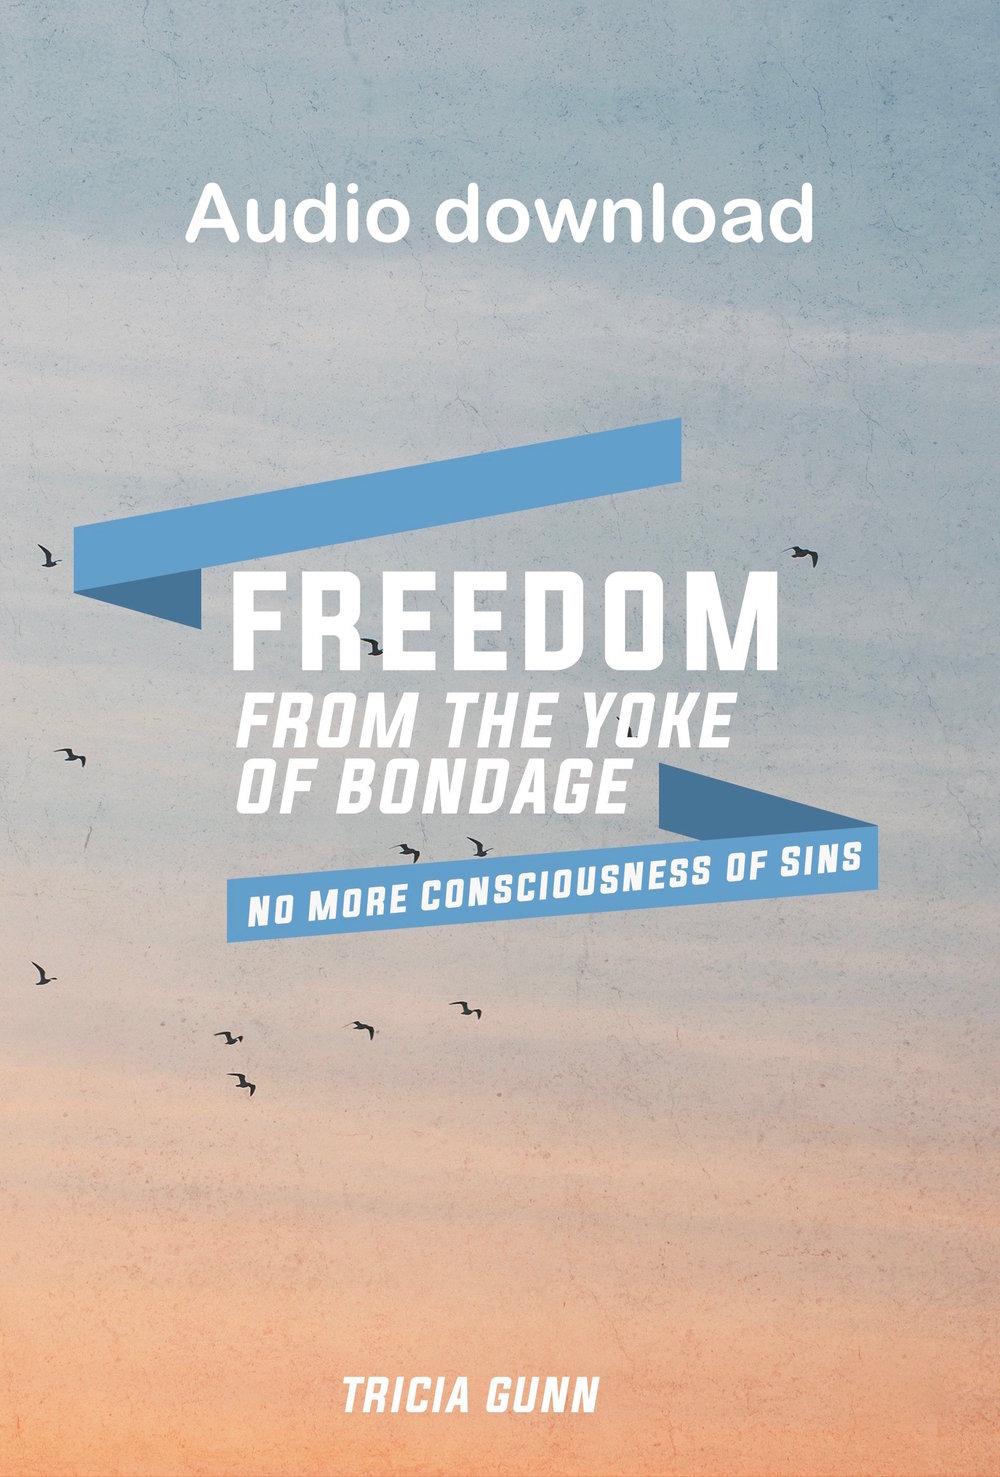 Freedom_audio-1.jpg